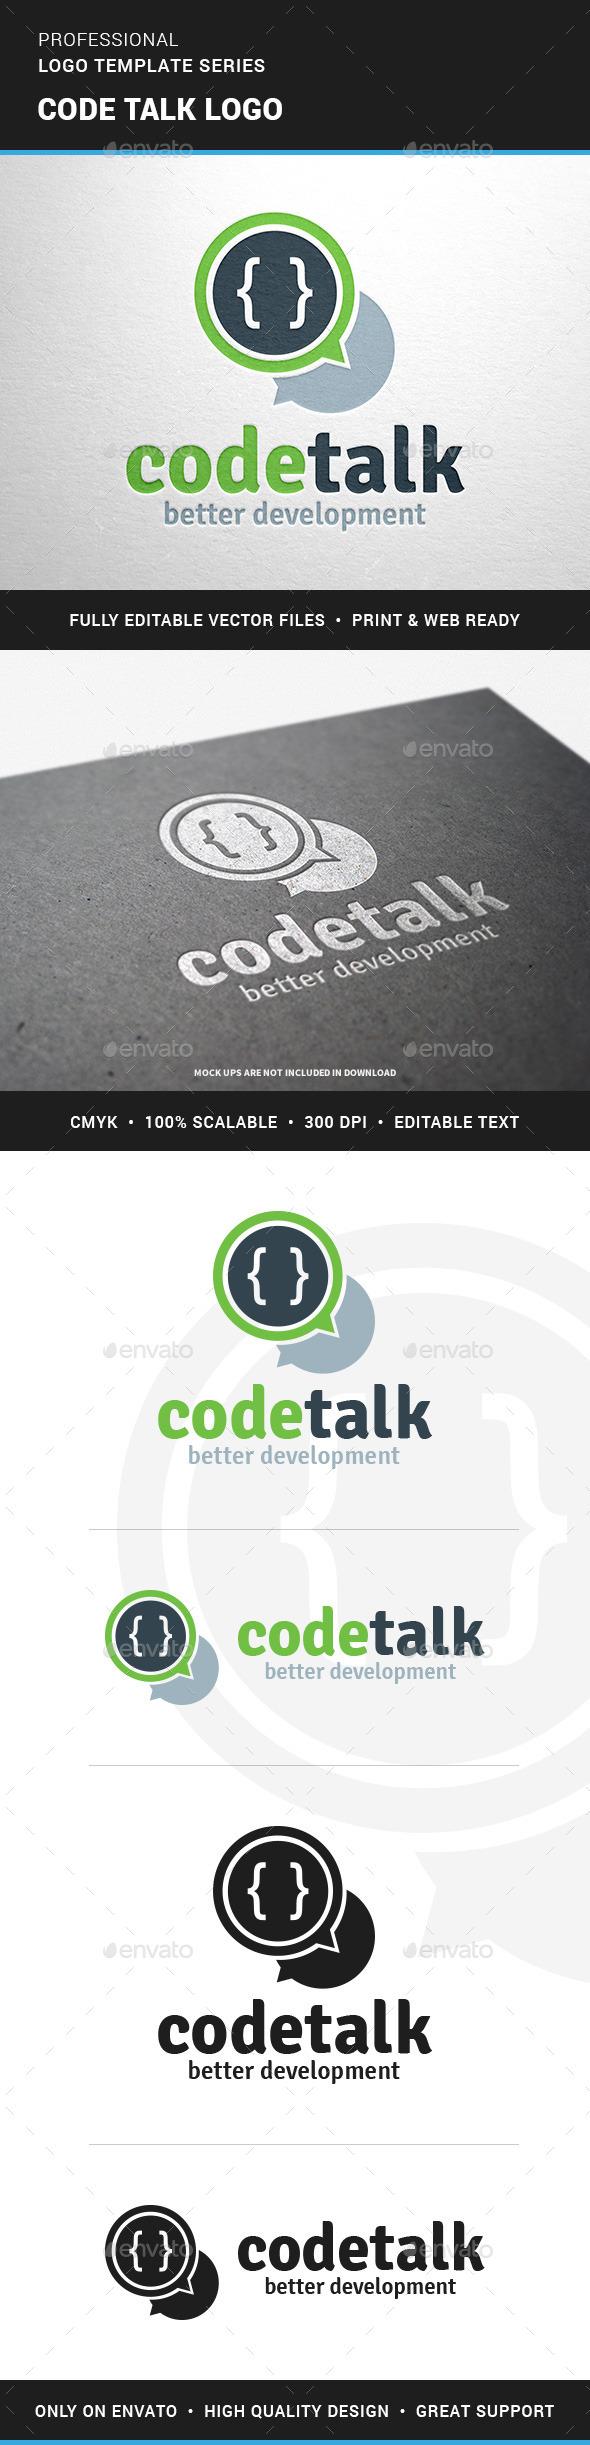 Code Talk Logo Template - Symbols Logo Templates